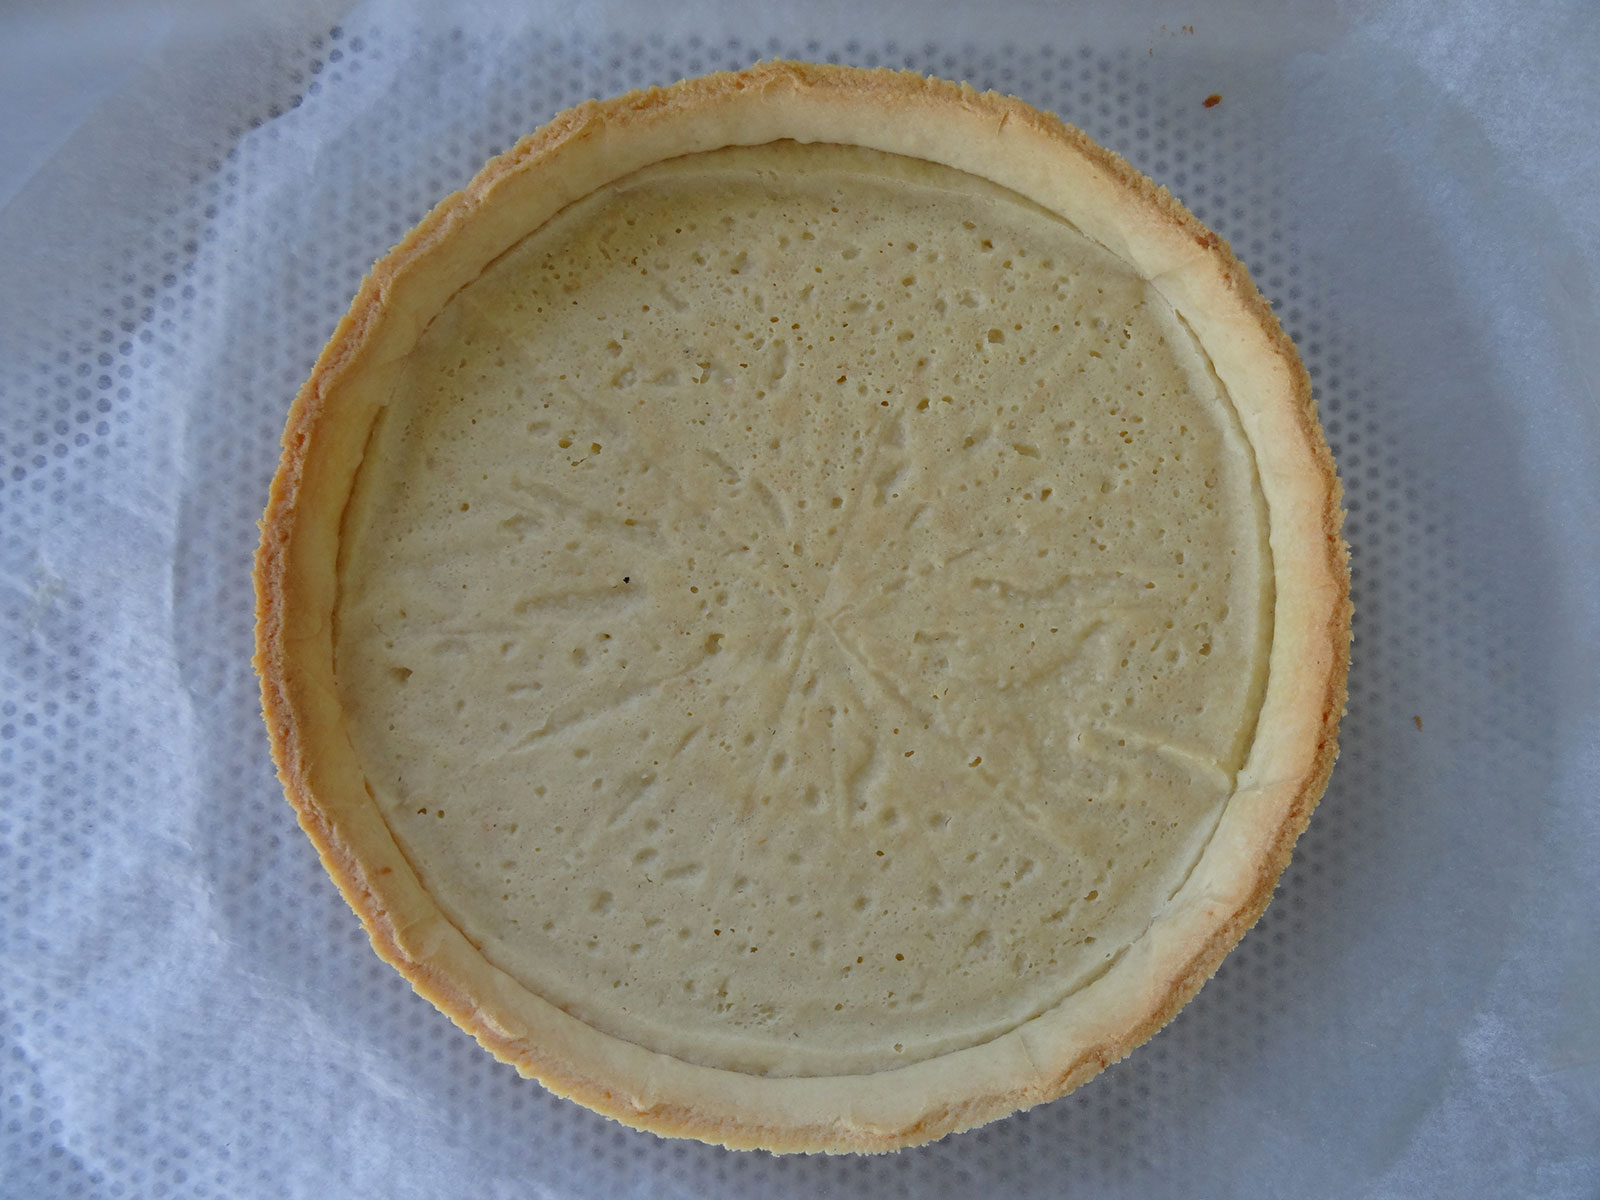 Pâte sucrée de Pierre Hermé